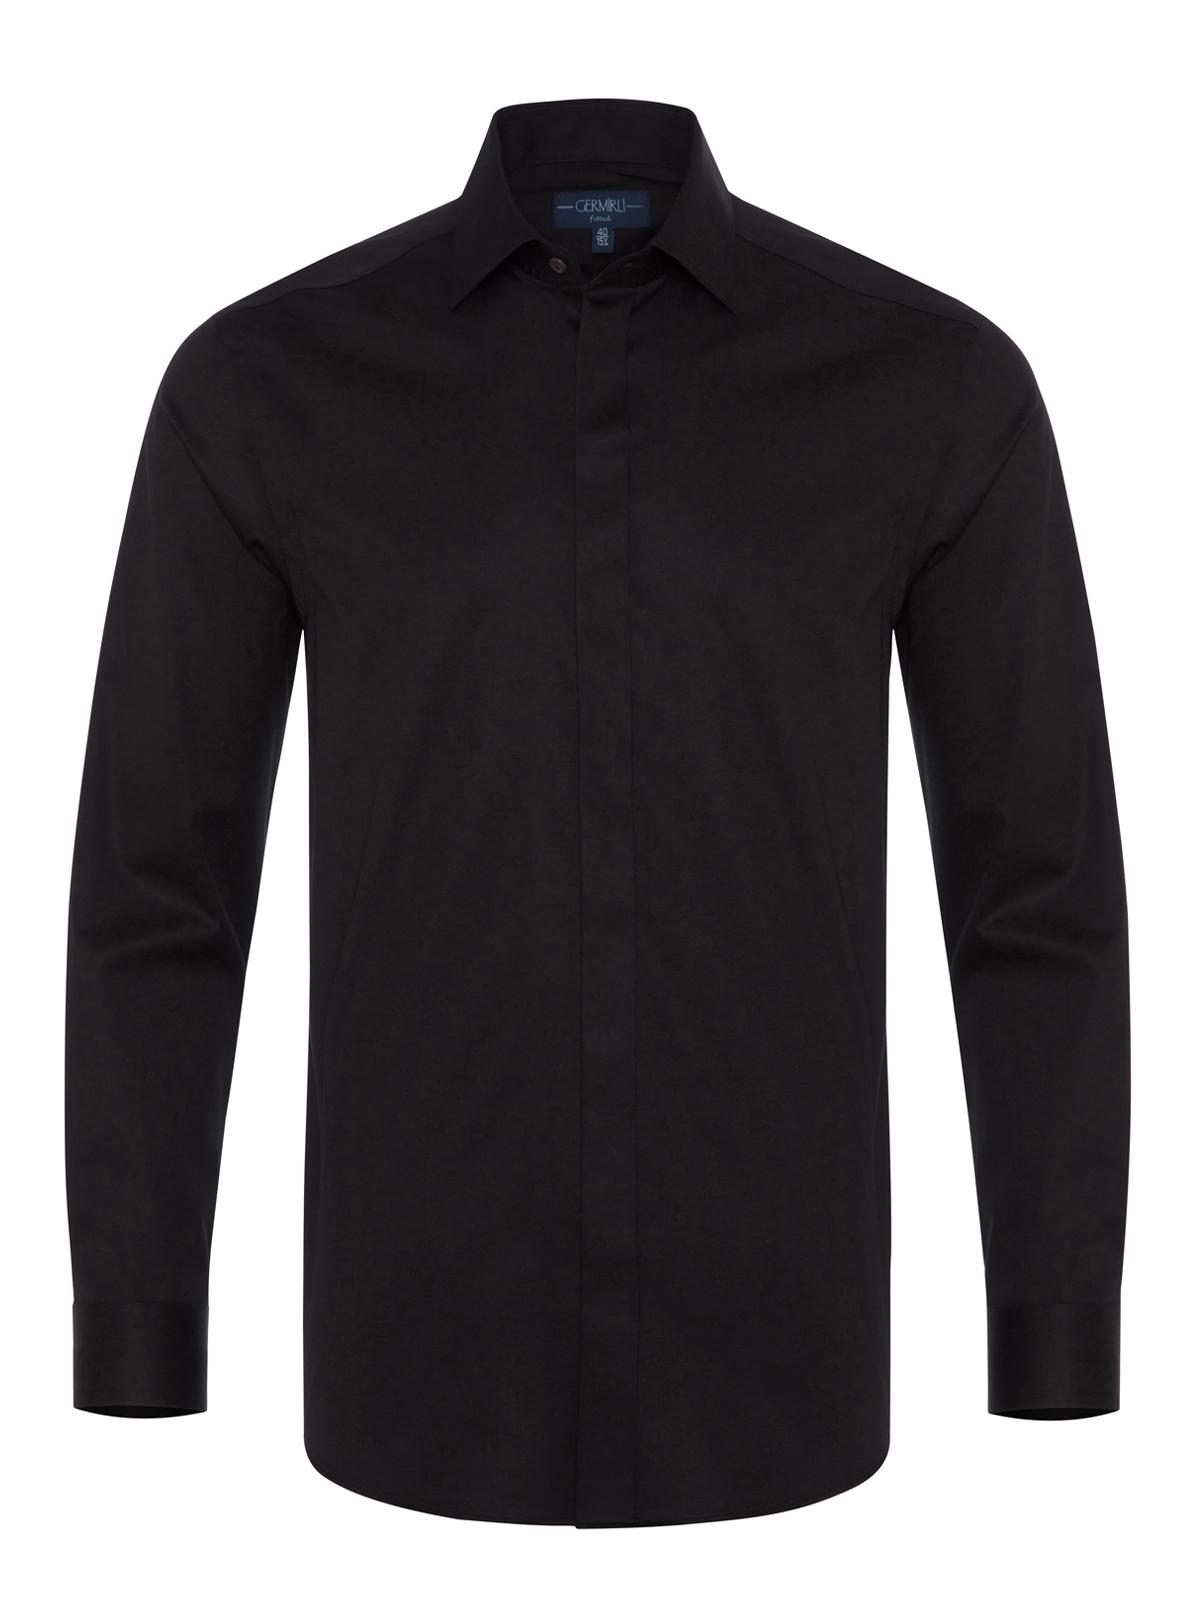 Germirli Siyah Poplin Gizli Pat Klasik Yaka Tailor Fit Gömlek